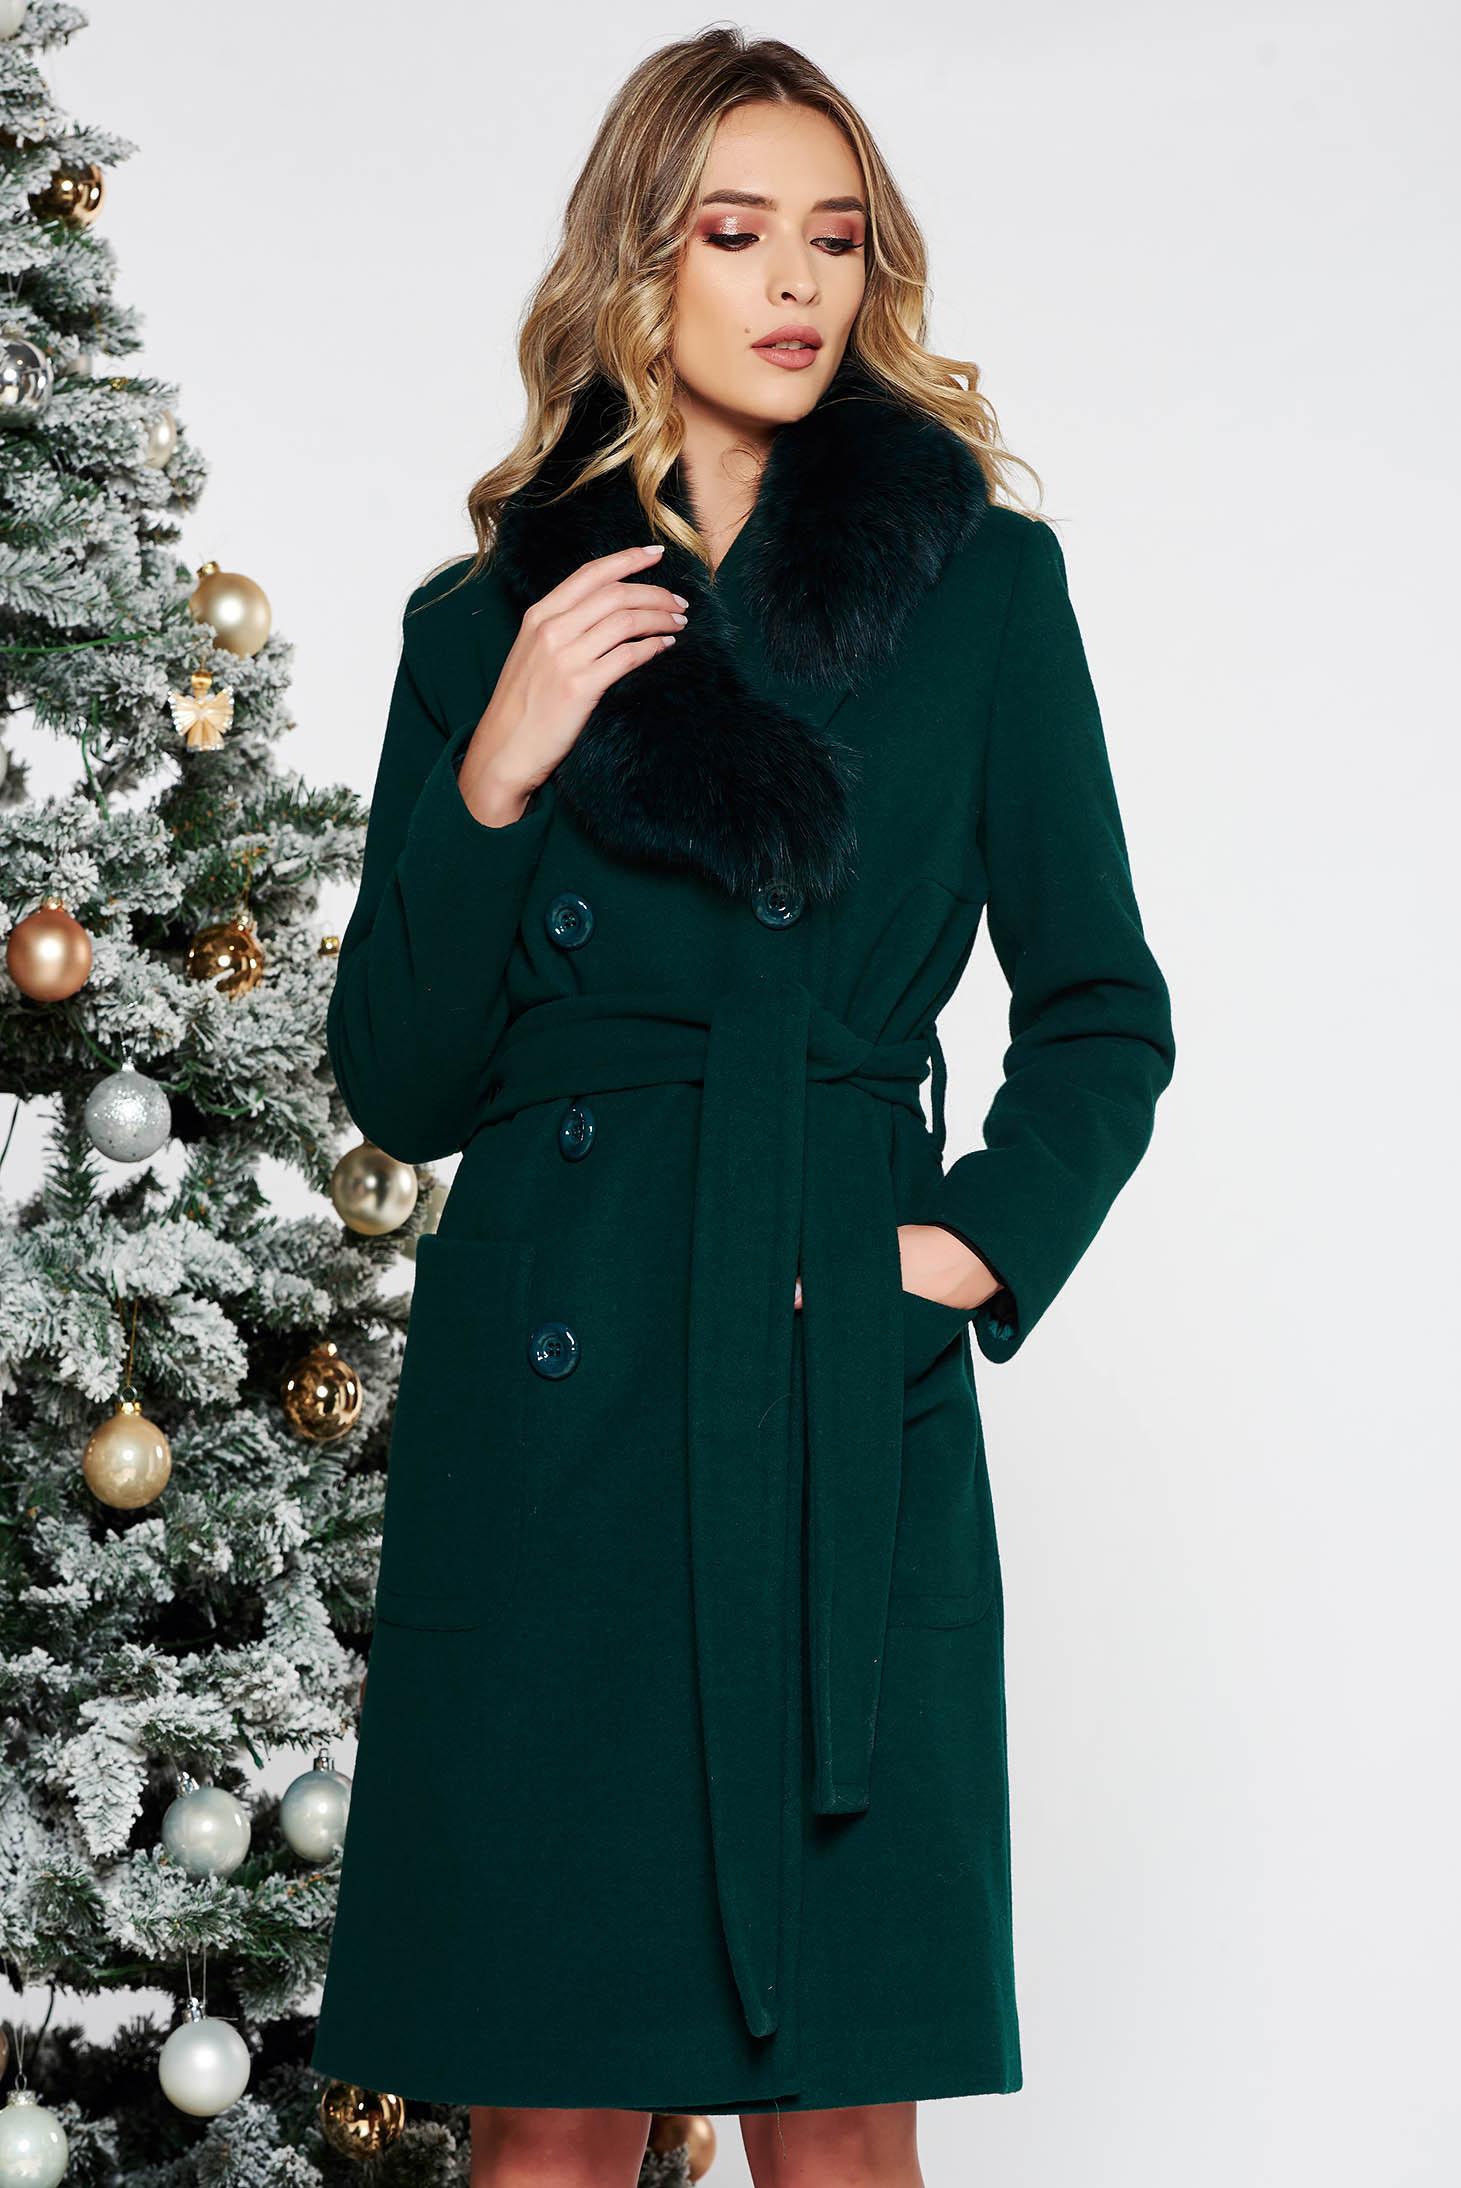 Palton LaDonna verde elegant cu un croi drept din lana cu guler din blana naturala